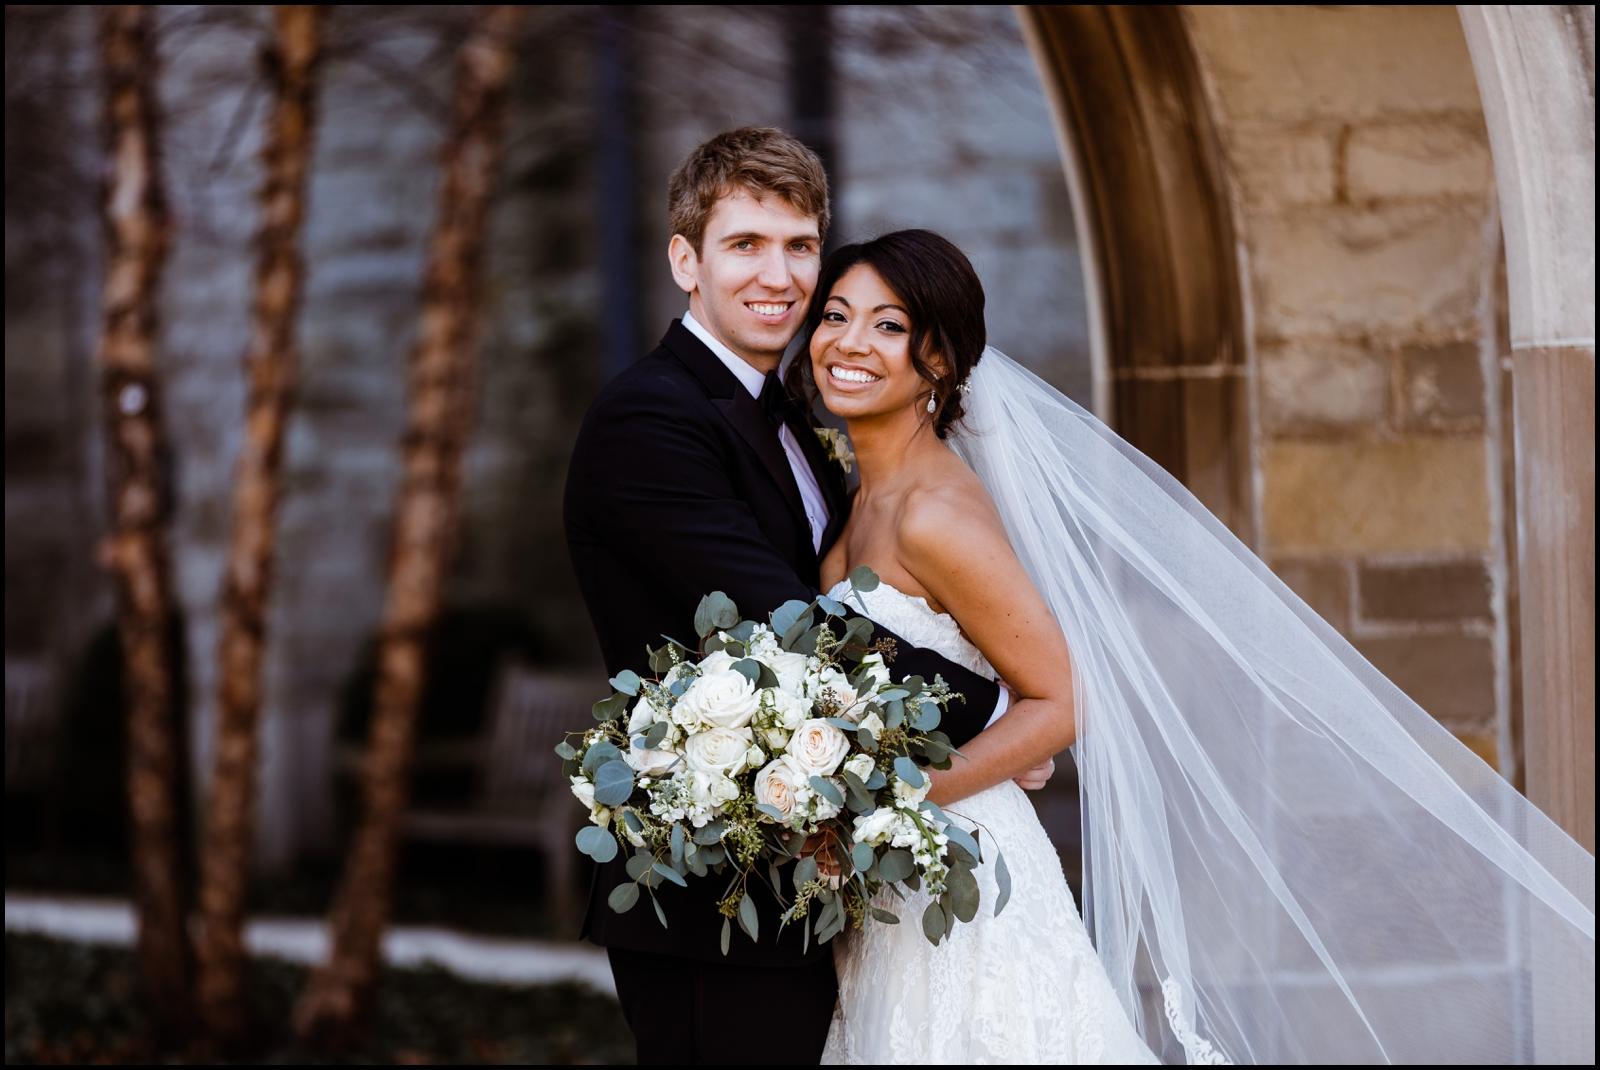 Chicago Wedding- Alice Millar Chapel Ceremony, London House Reception_0081.jpg